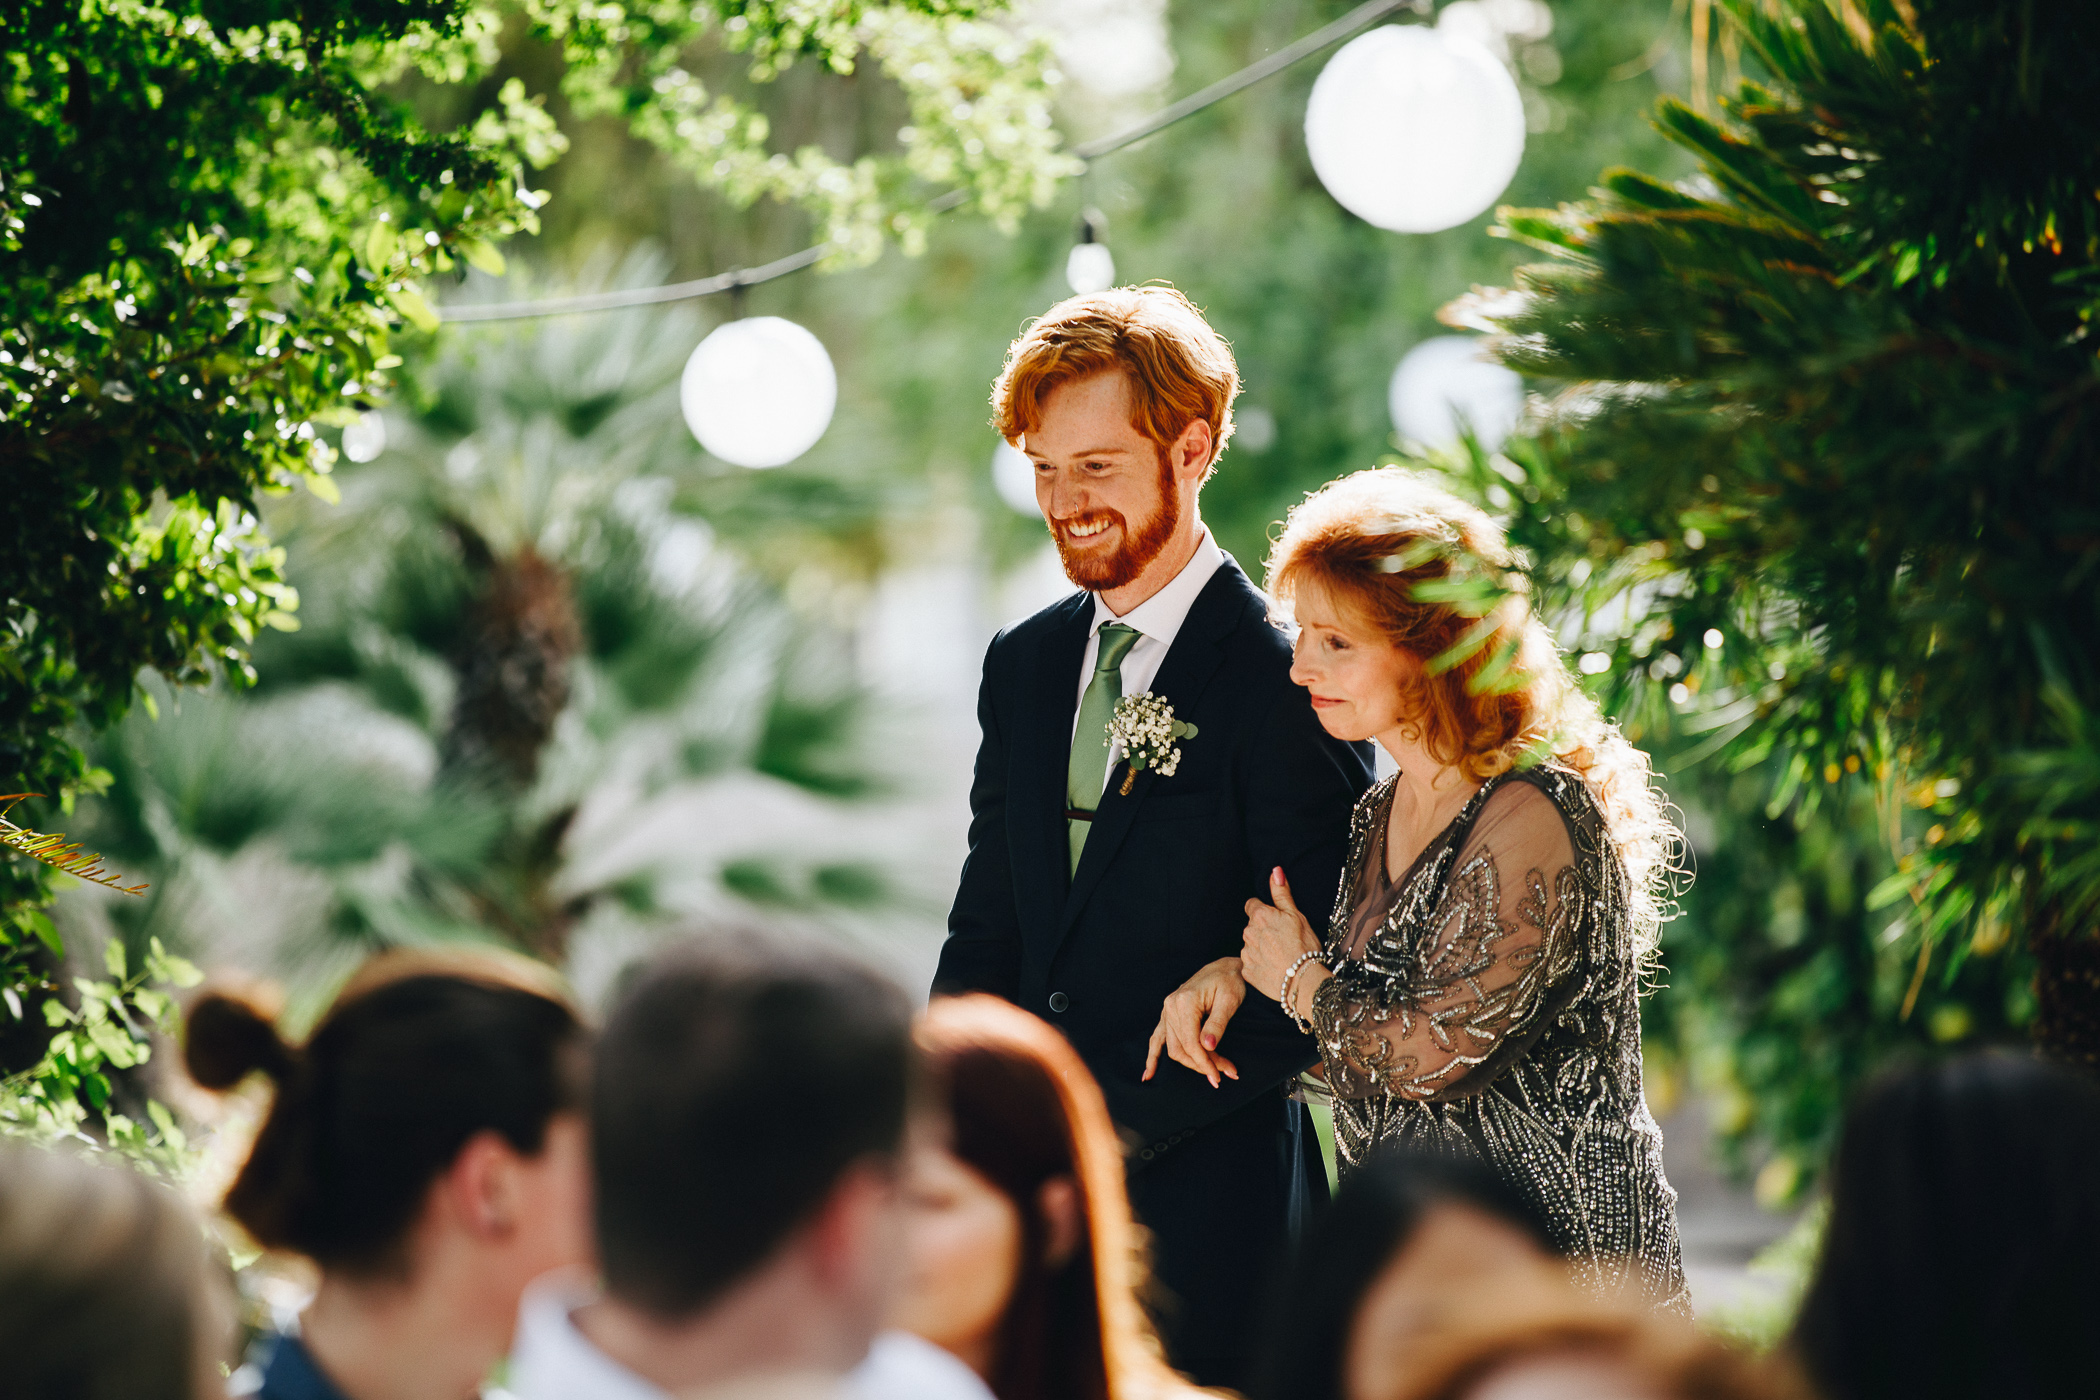 181104-Luxium-Weddings-Arizona-@matt__Le-Brandon-Kariana-Phoenix-Valley-Garden-Center-1055.jpg